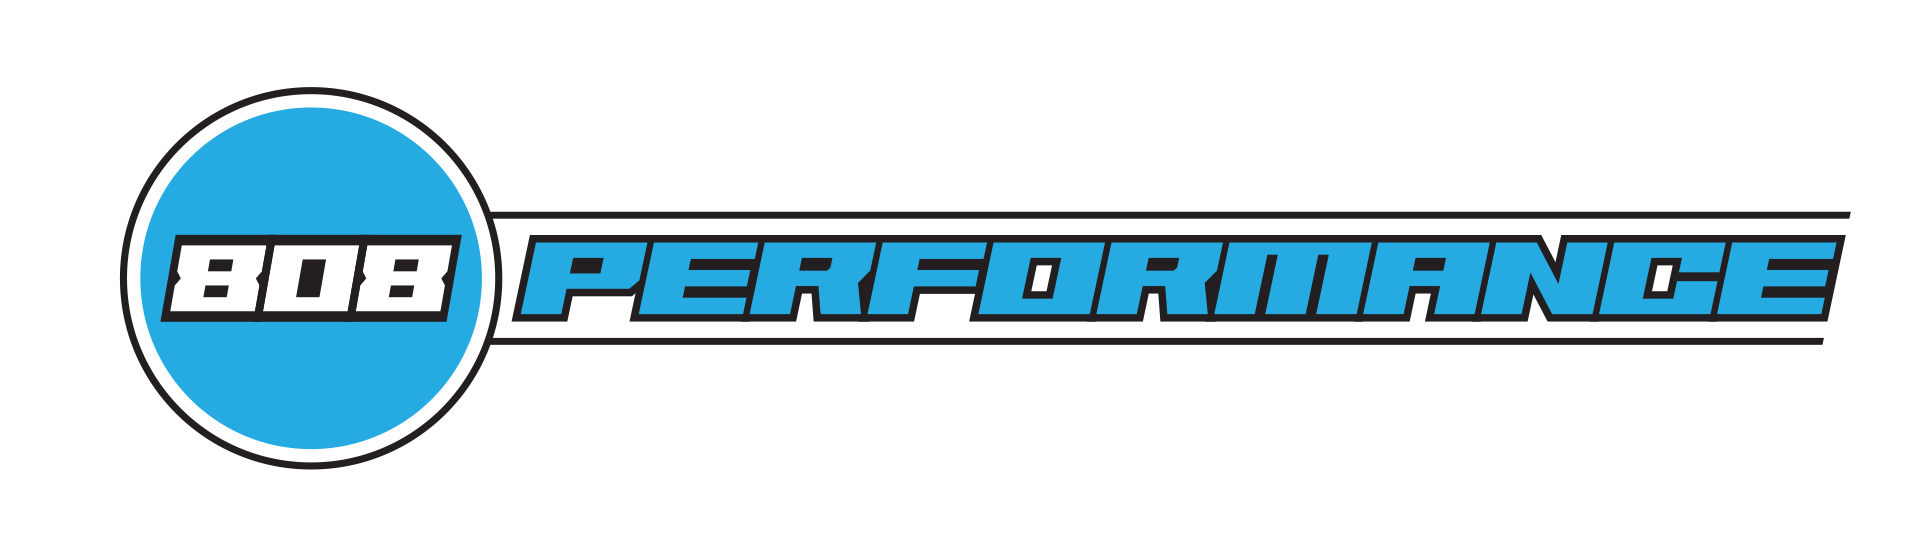 808 Performance logo